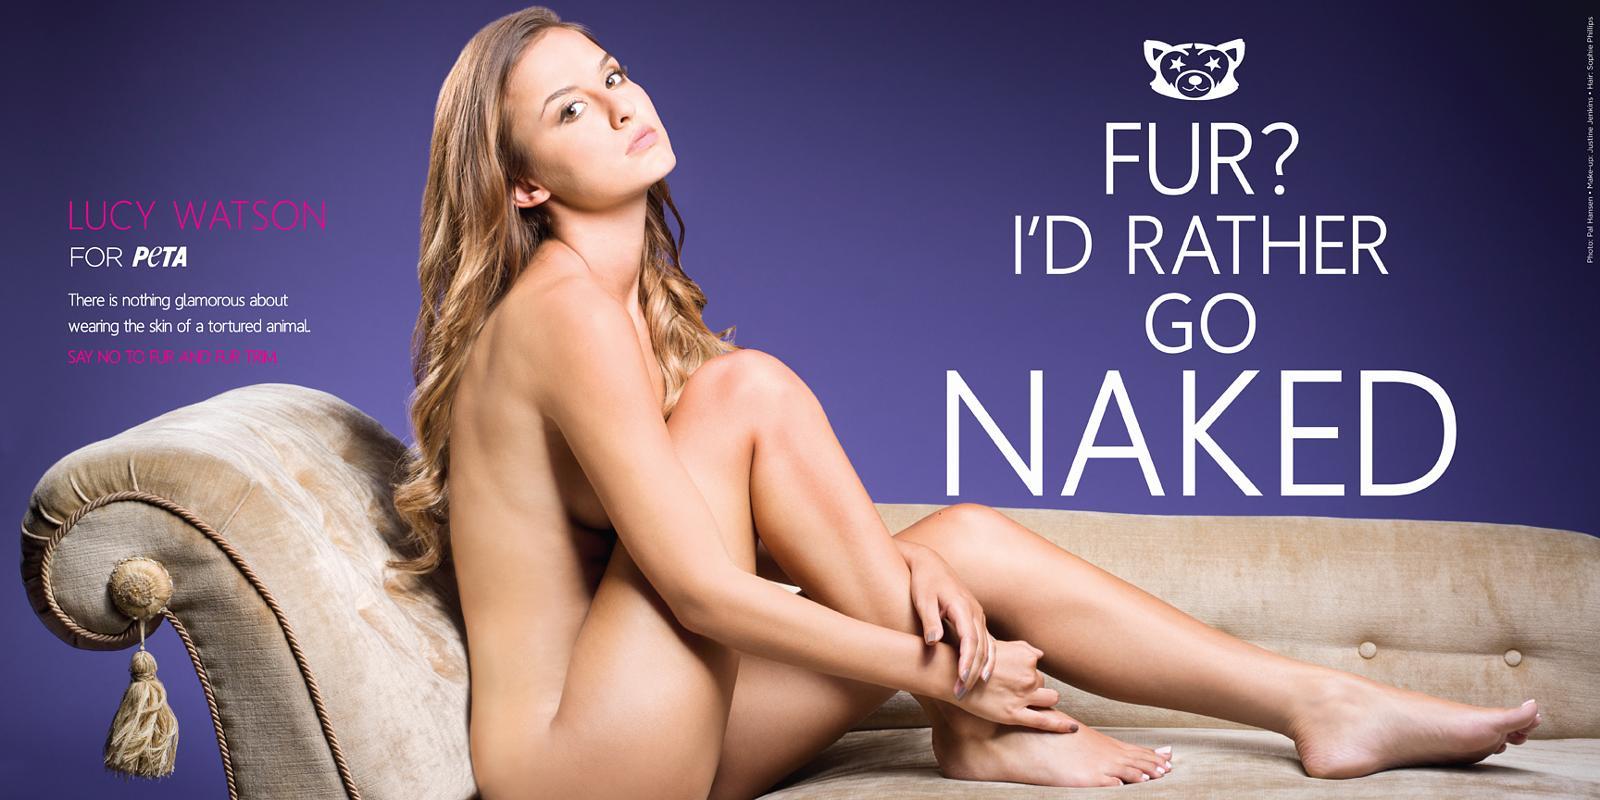 Latest celebrity to go nude